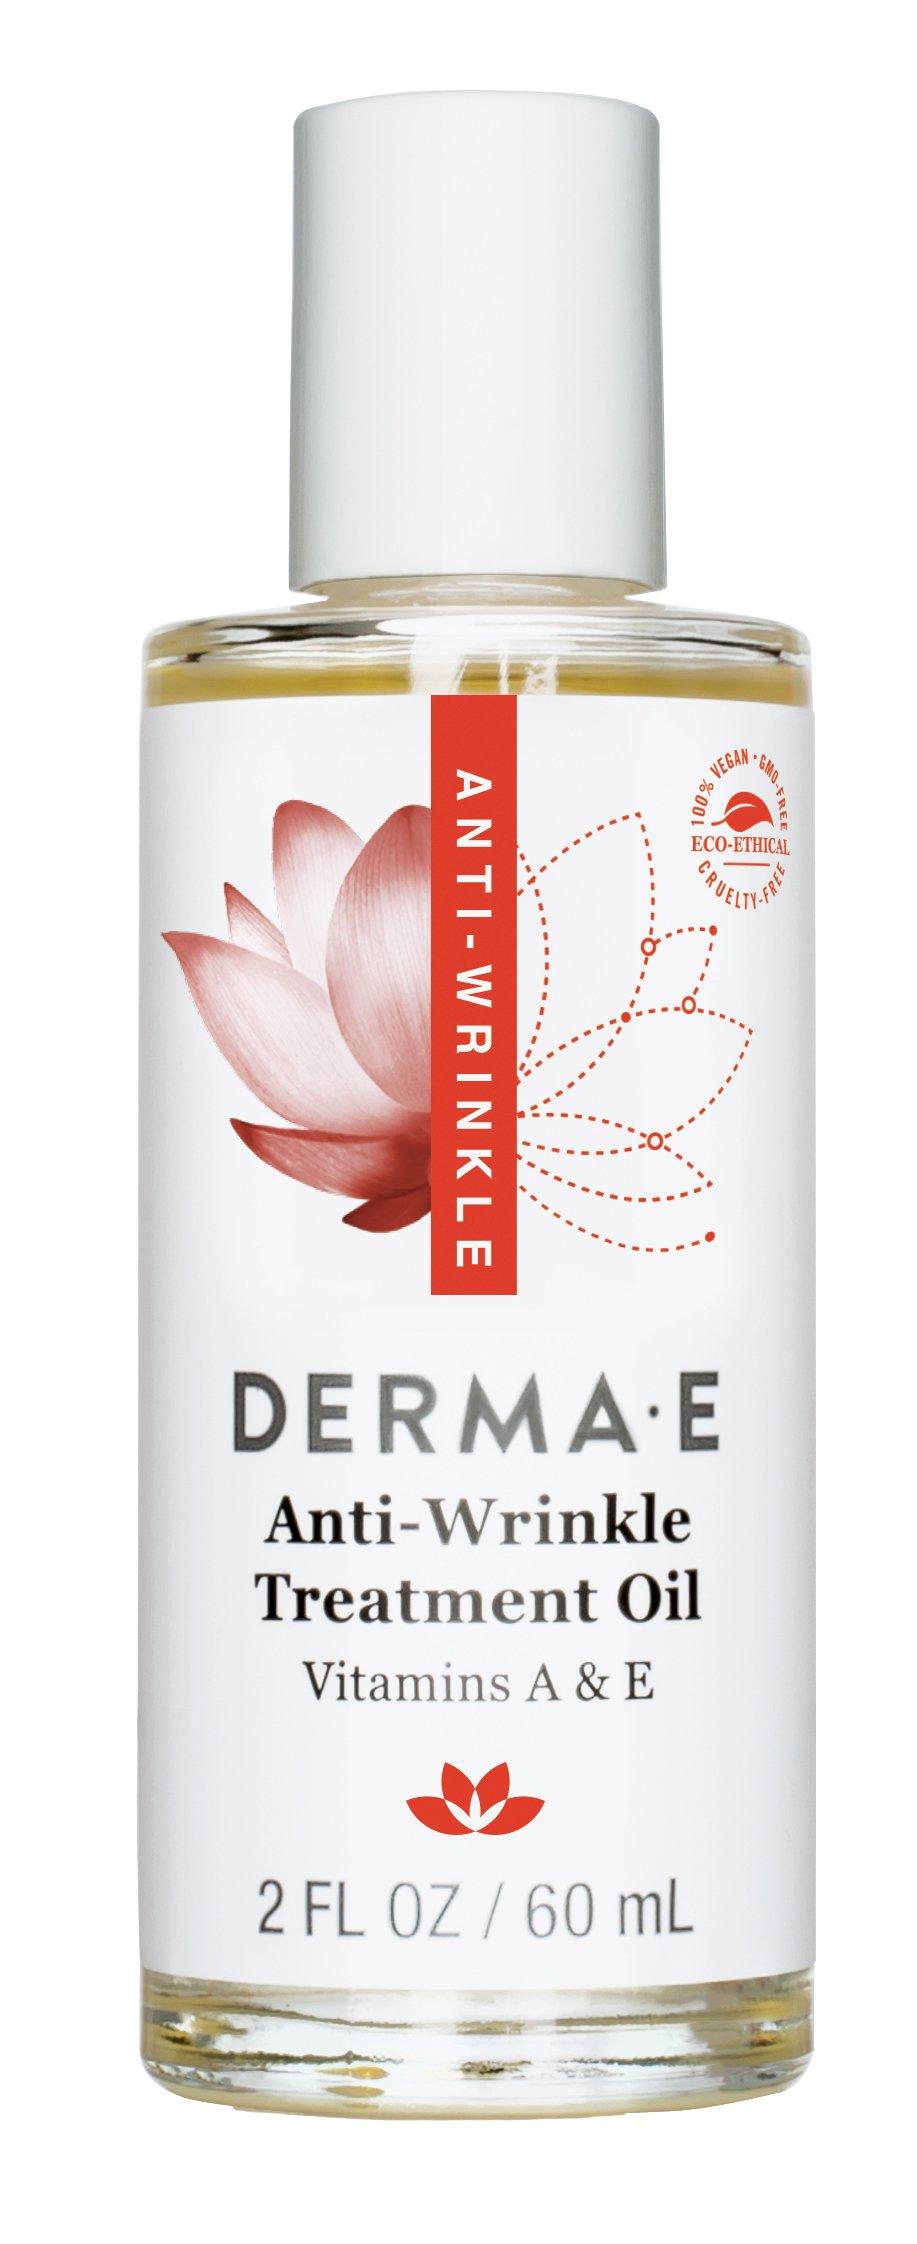 Derma E: Anti-Wrinkle Vitamin A & E Treatment Oil, 2 oz (Pack of 3)